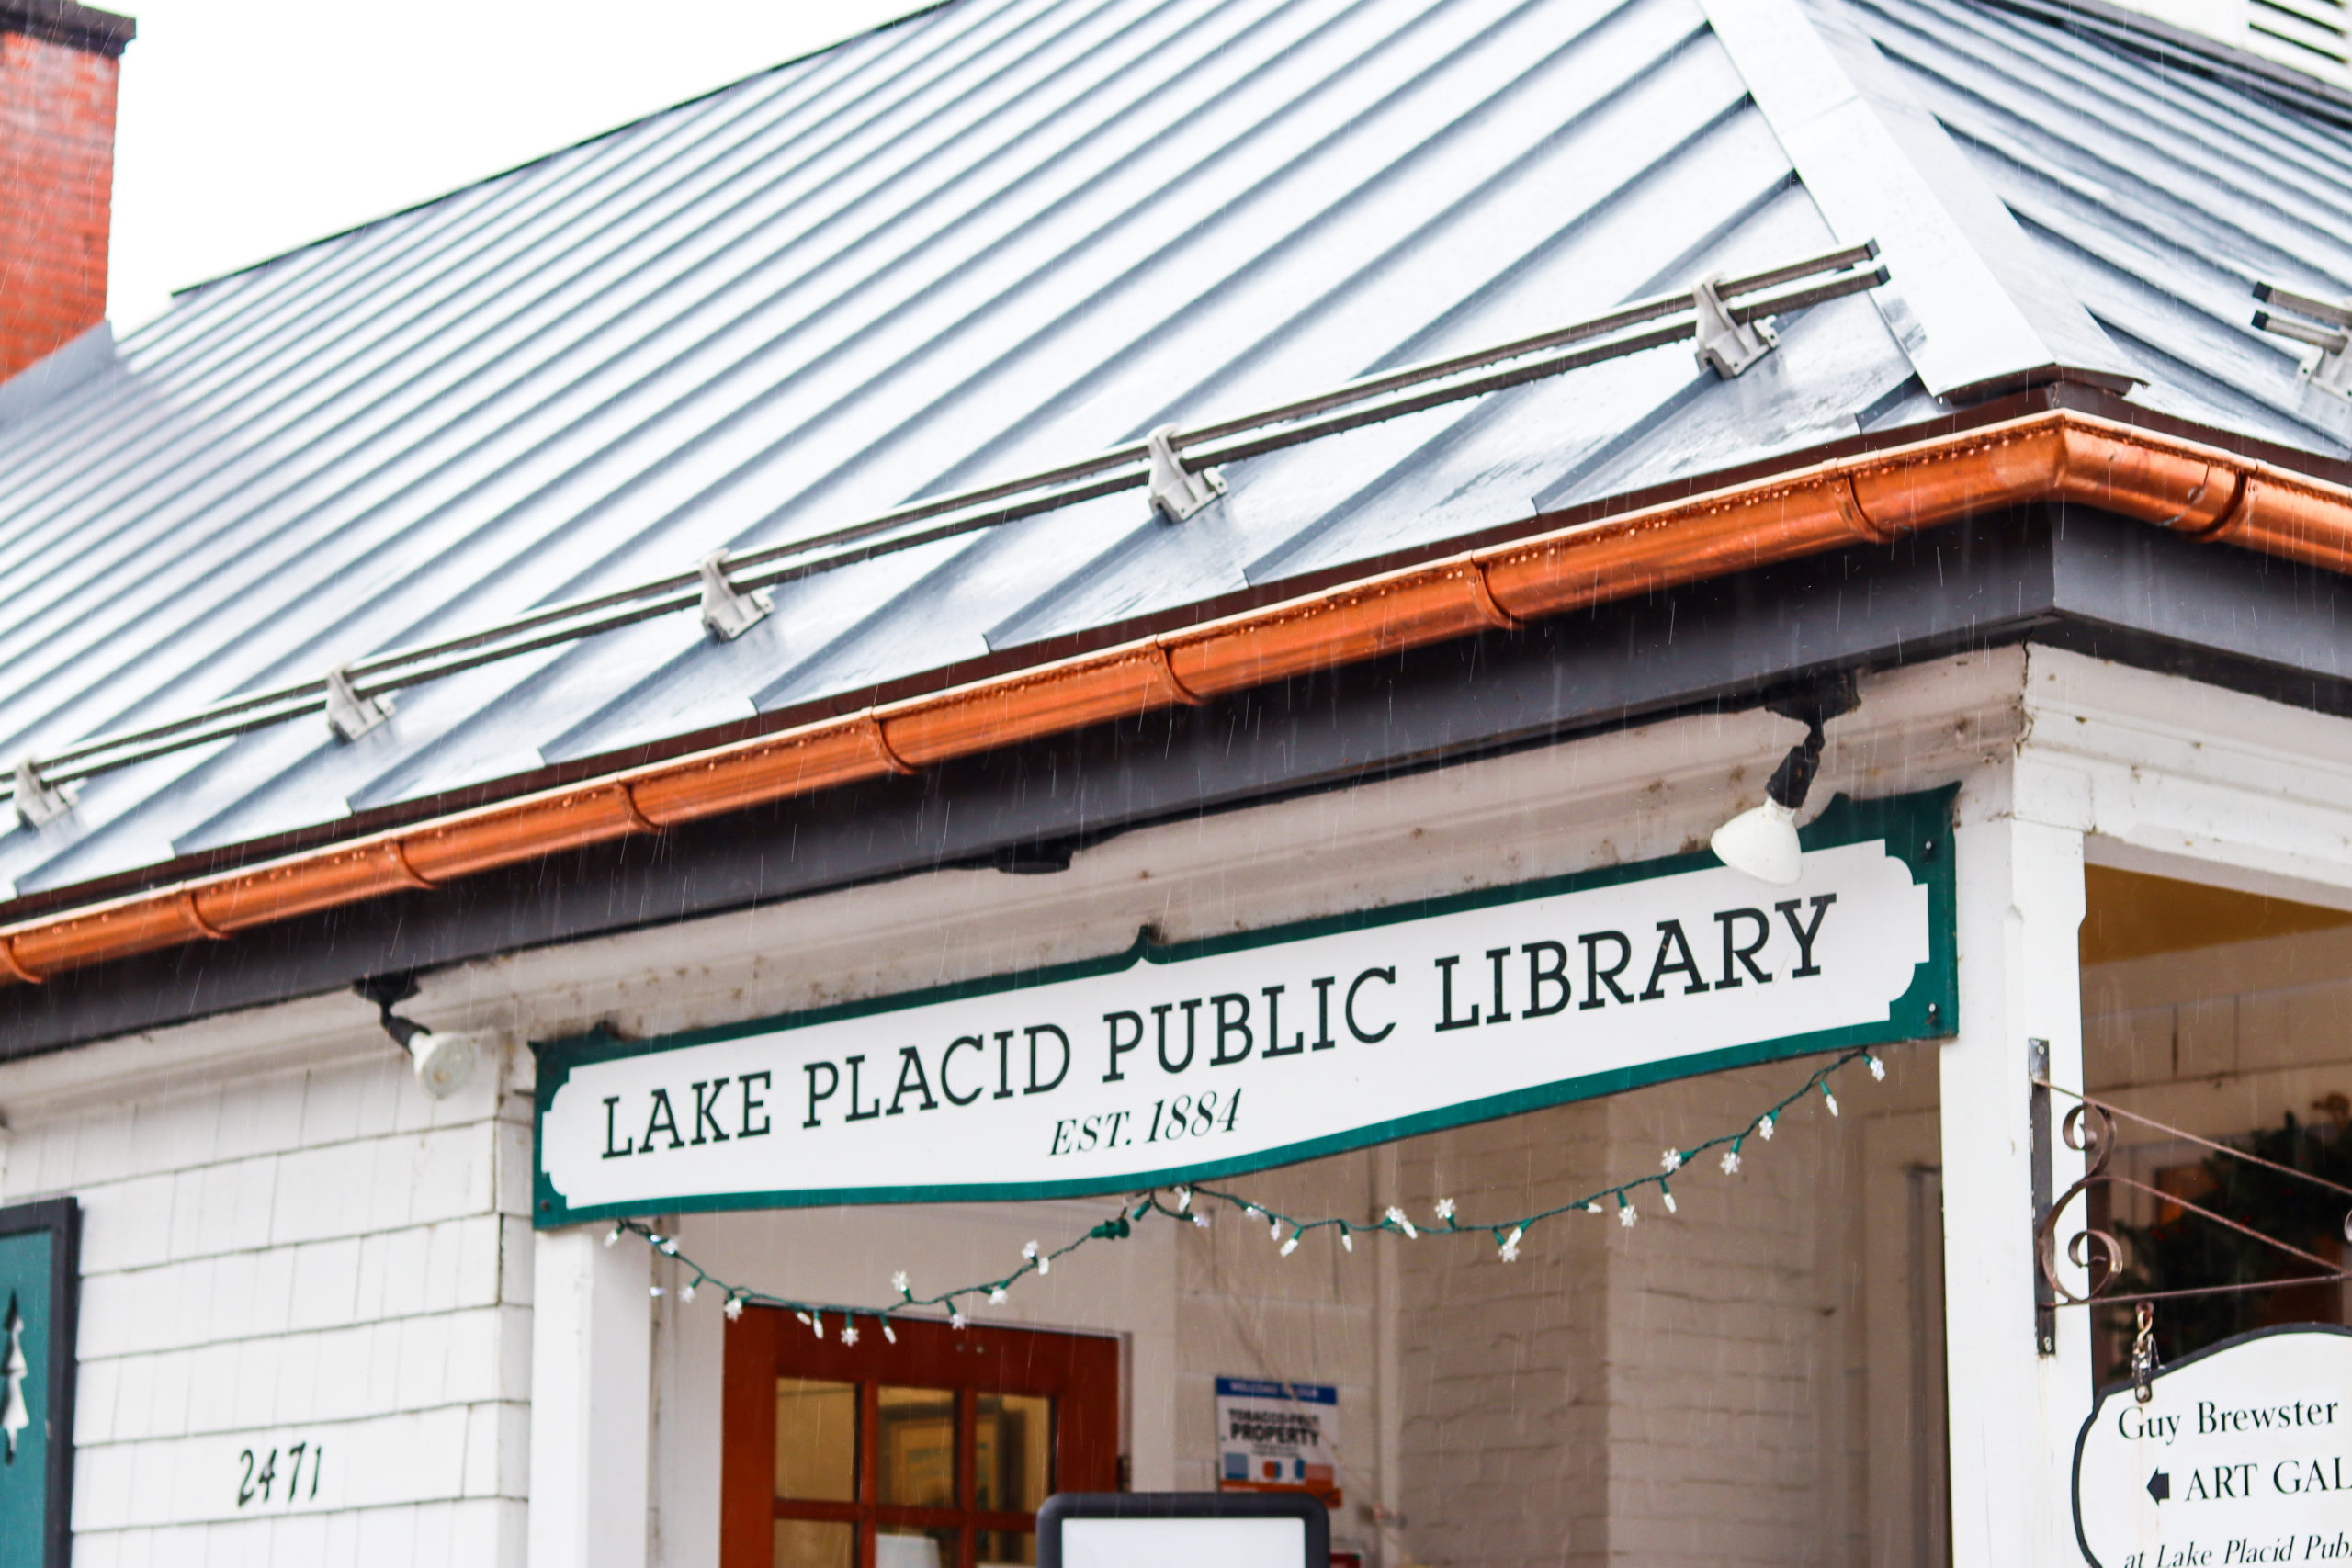 Lake Placid Public Library